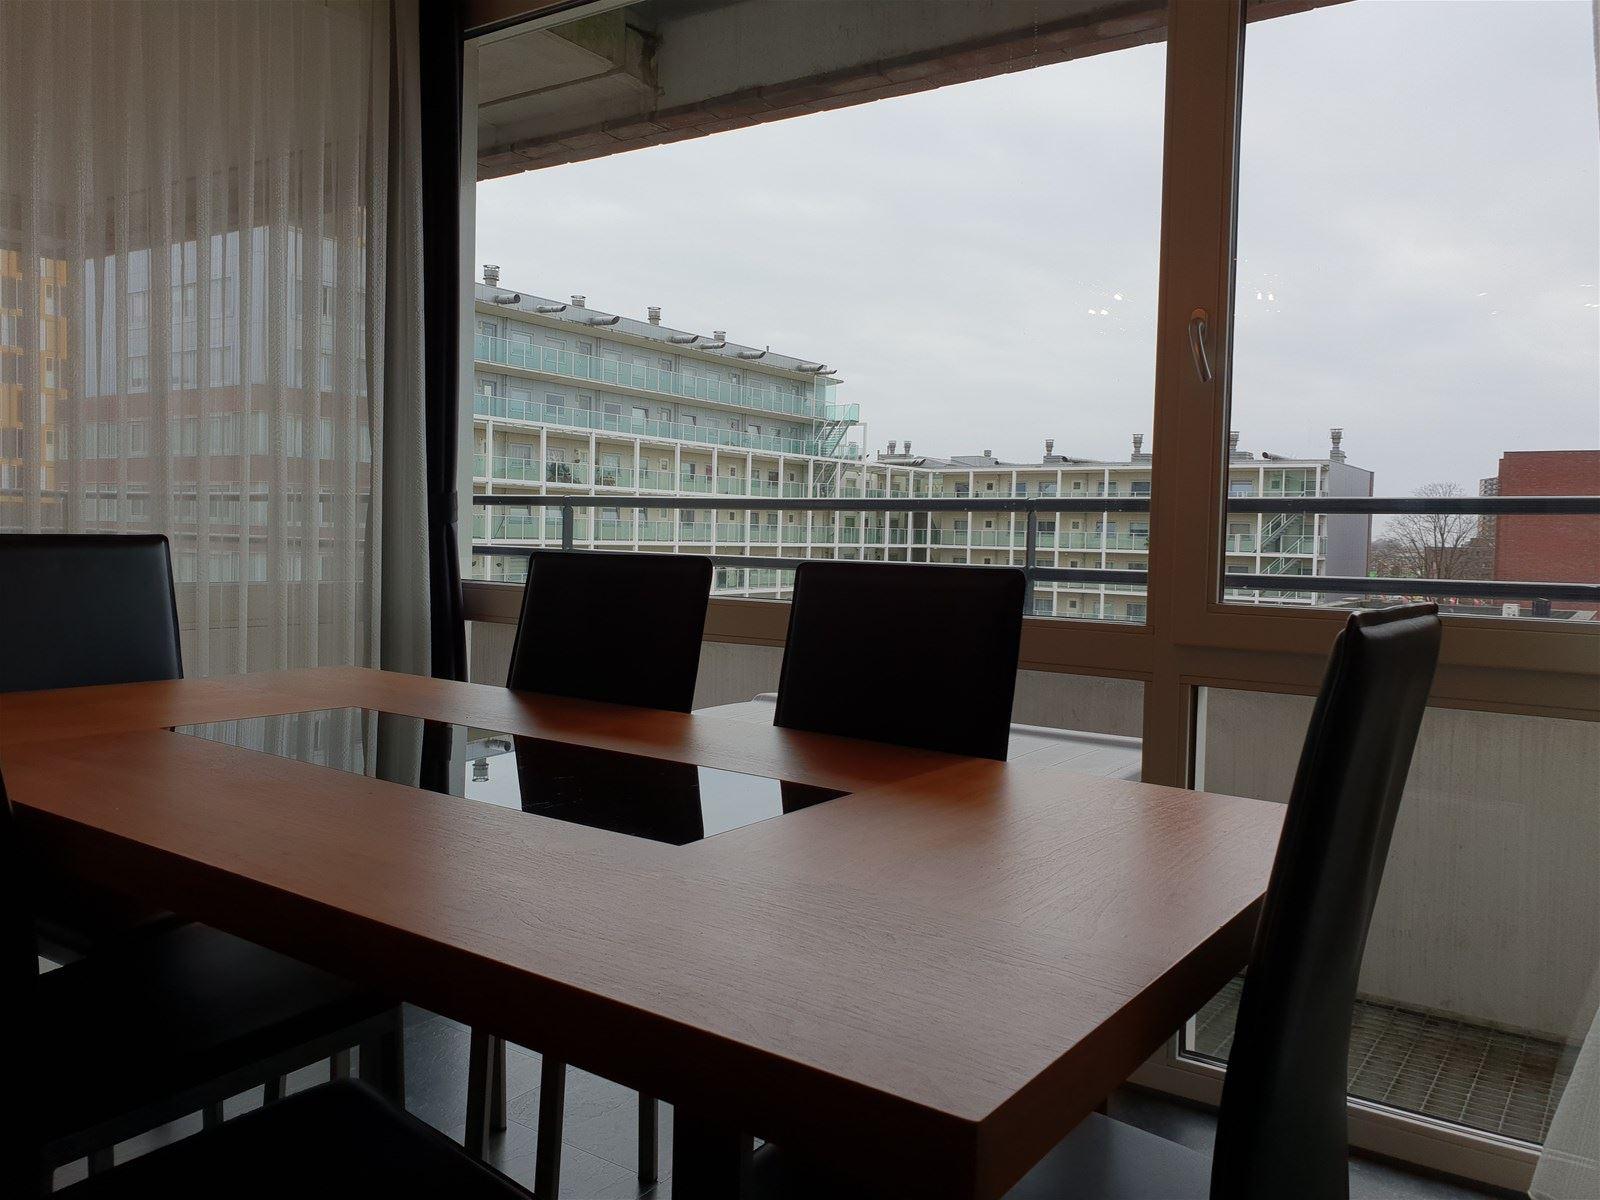 Johan Hofmanstraat, Amsterdam